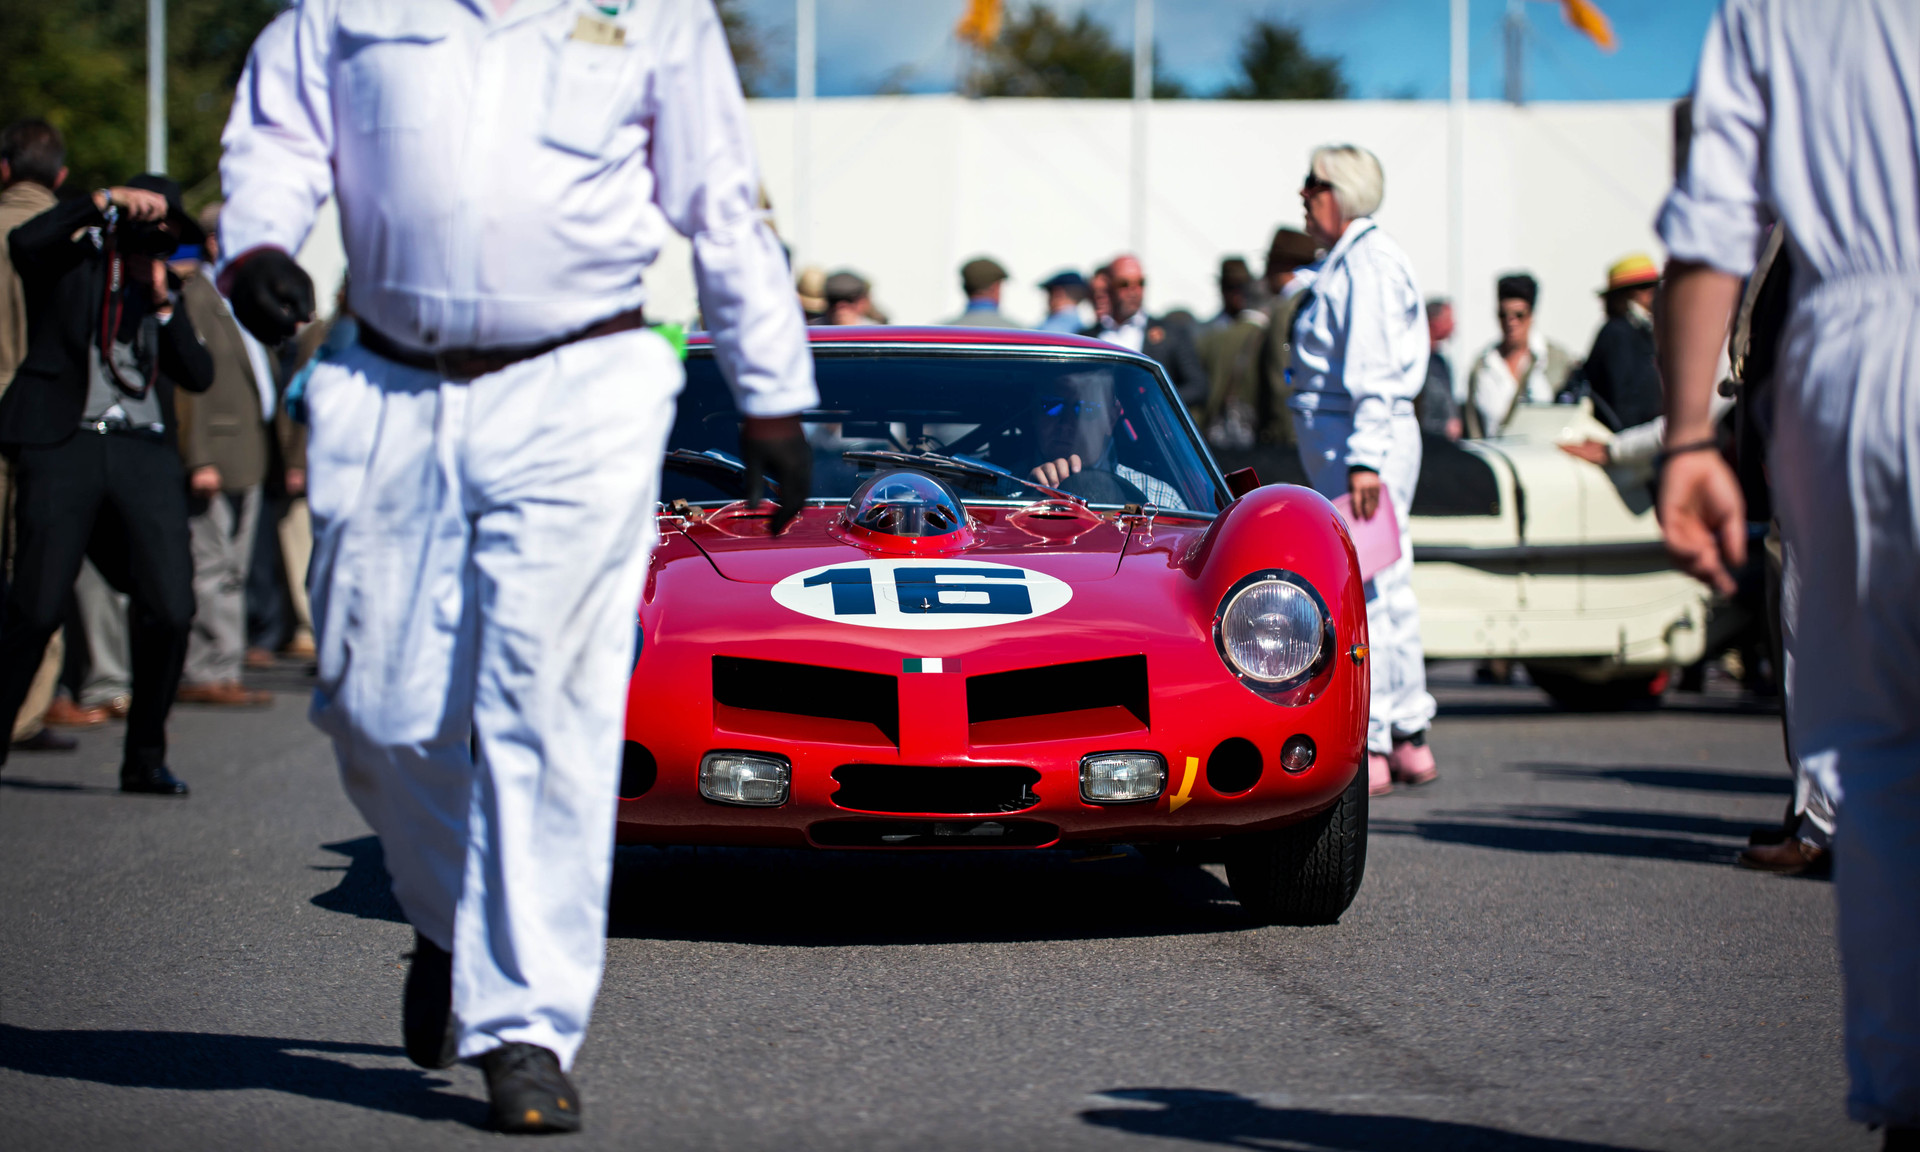 Niklas Halusa & Emanuele Pirro's 1963 Ferrari 250 GT SWB Breadvan